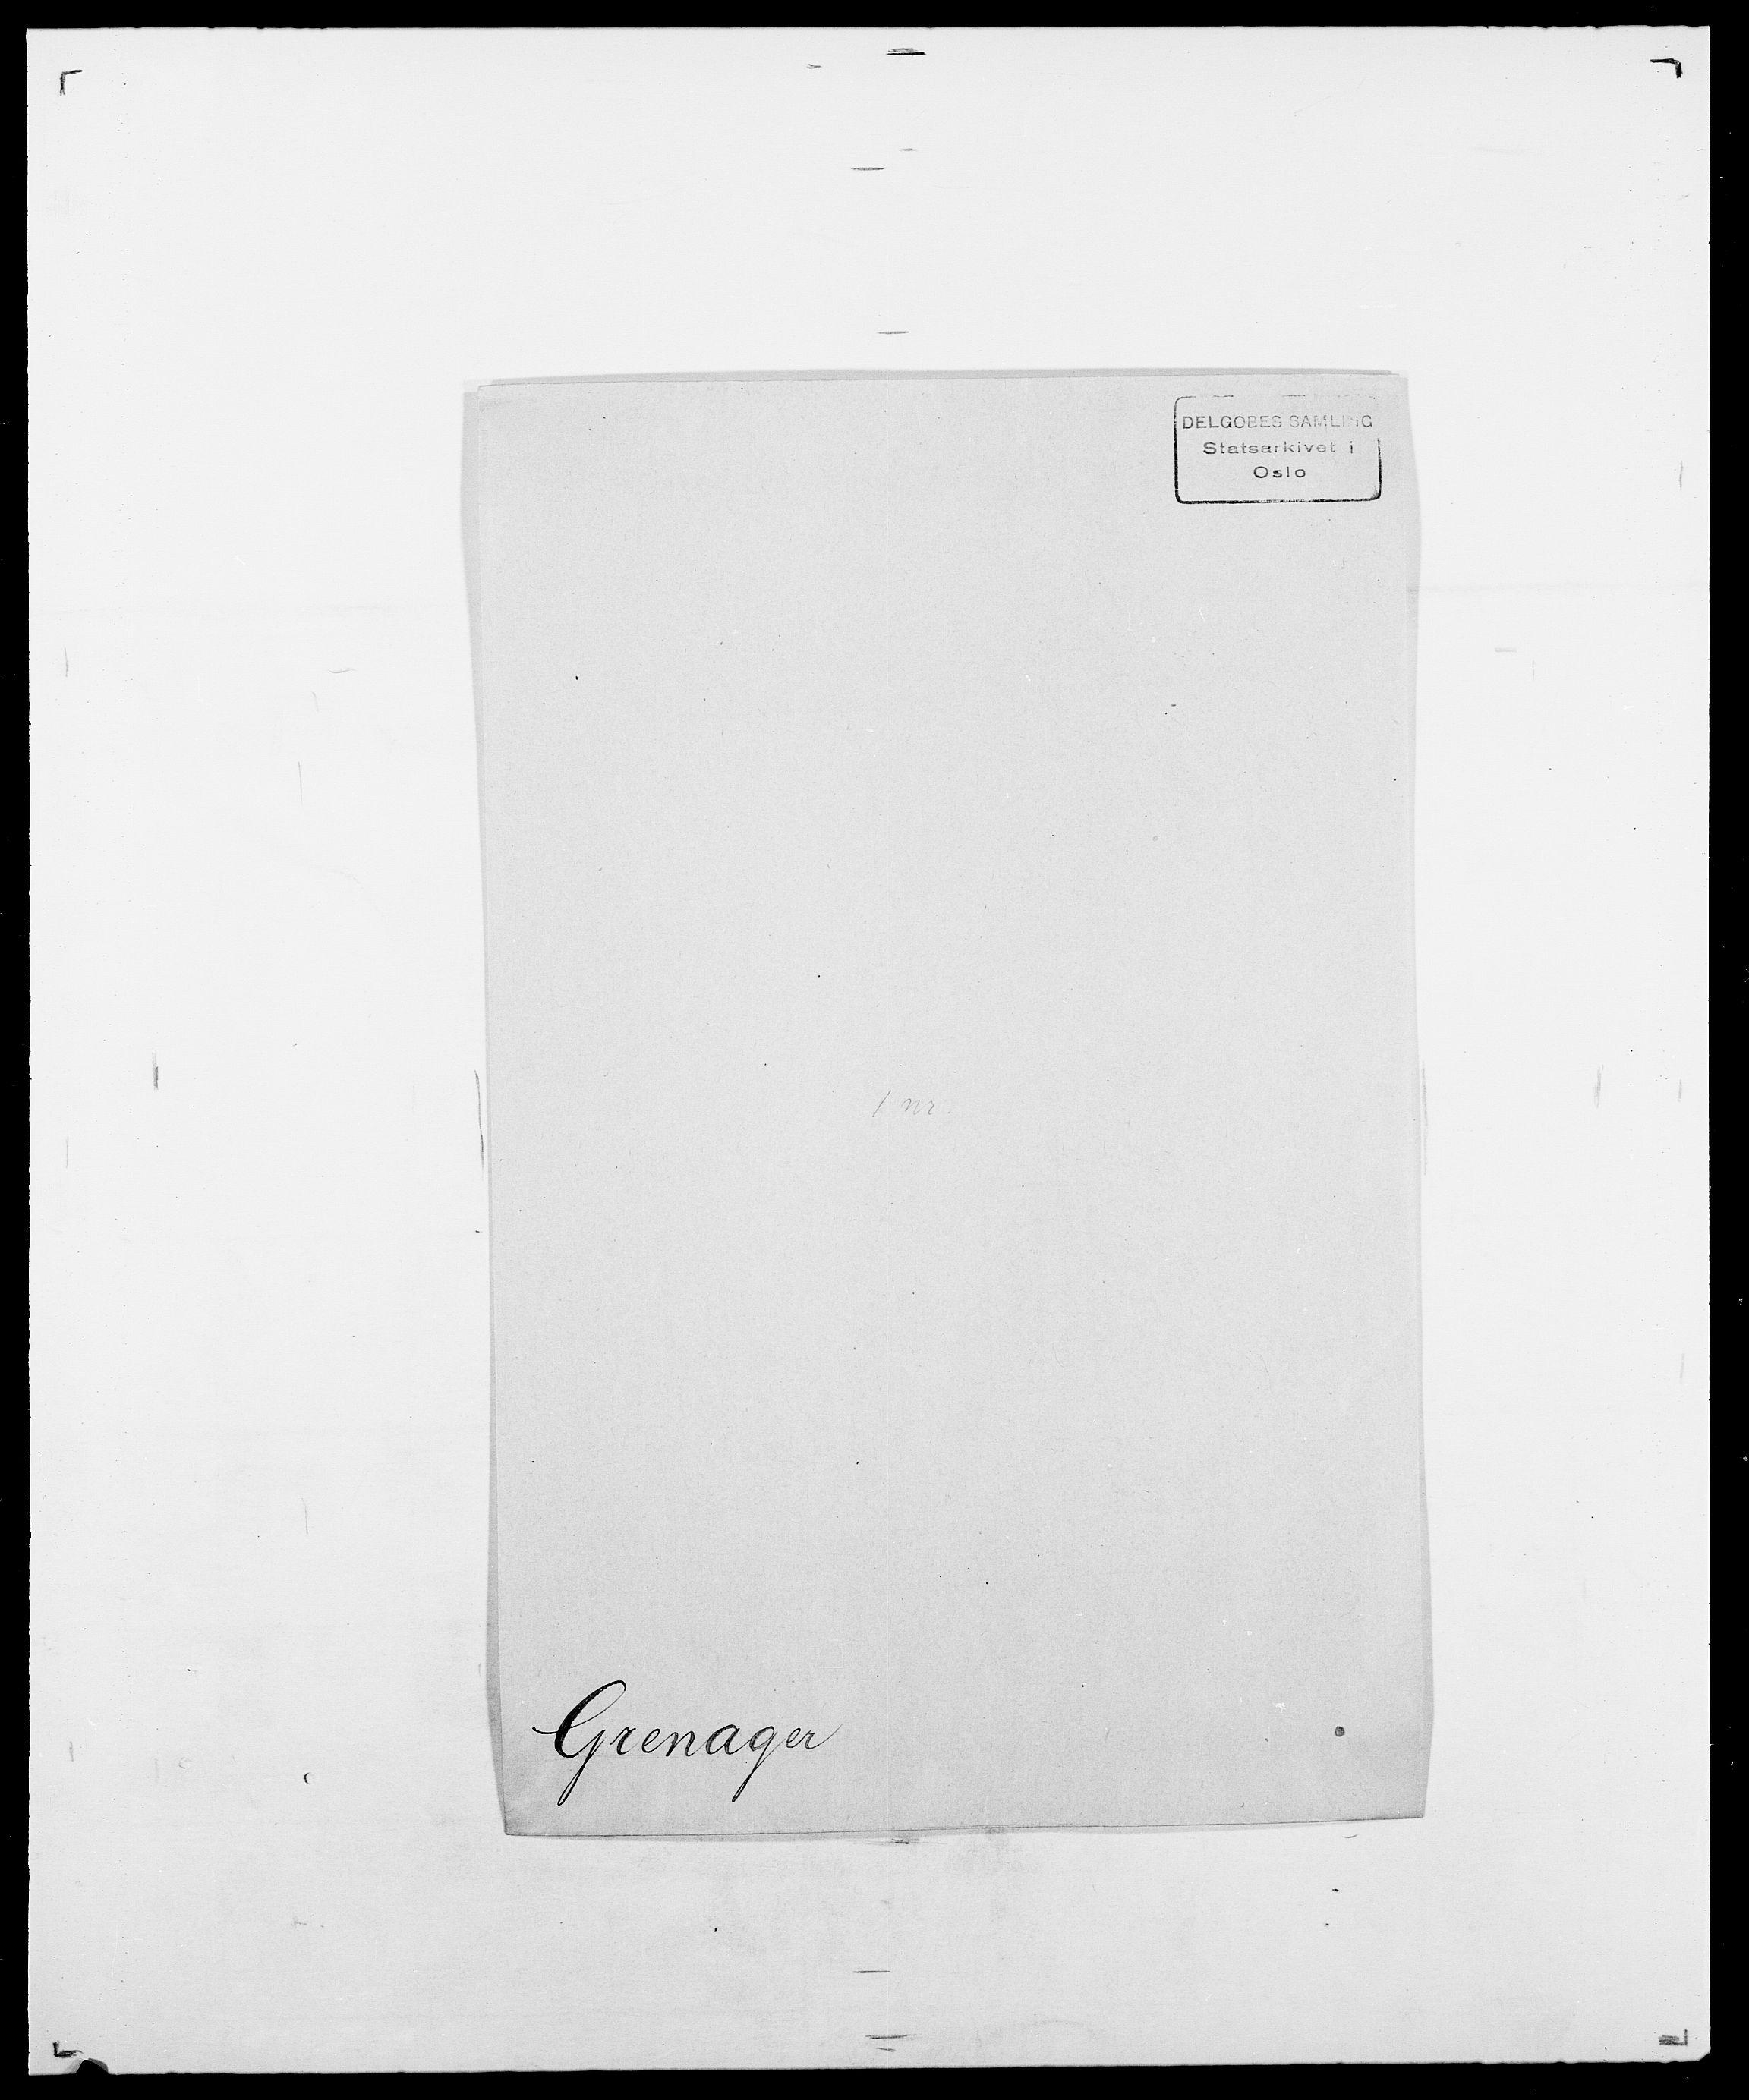 SAO, Delgobe, Charles Antoine - samling, D/Da/L0014: Giebdhausen - Grip, s. 606